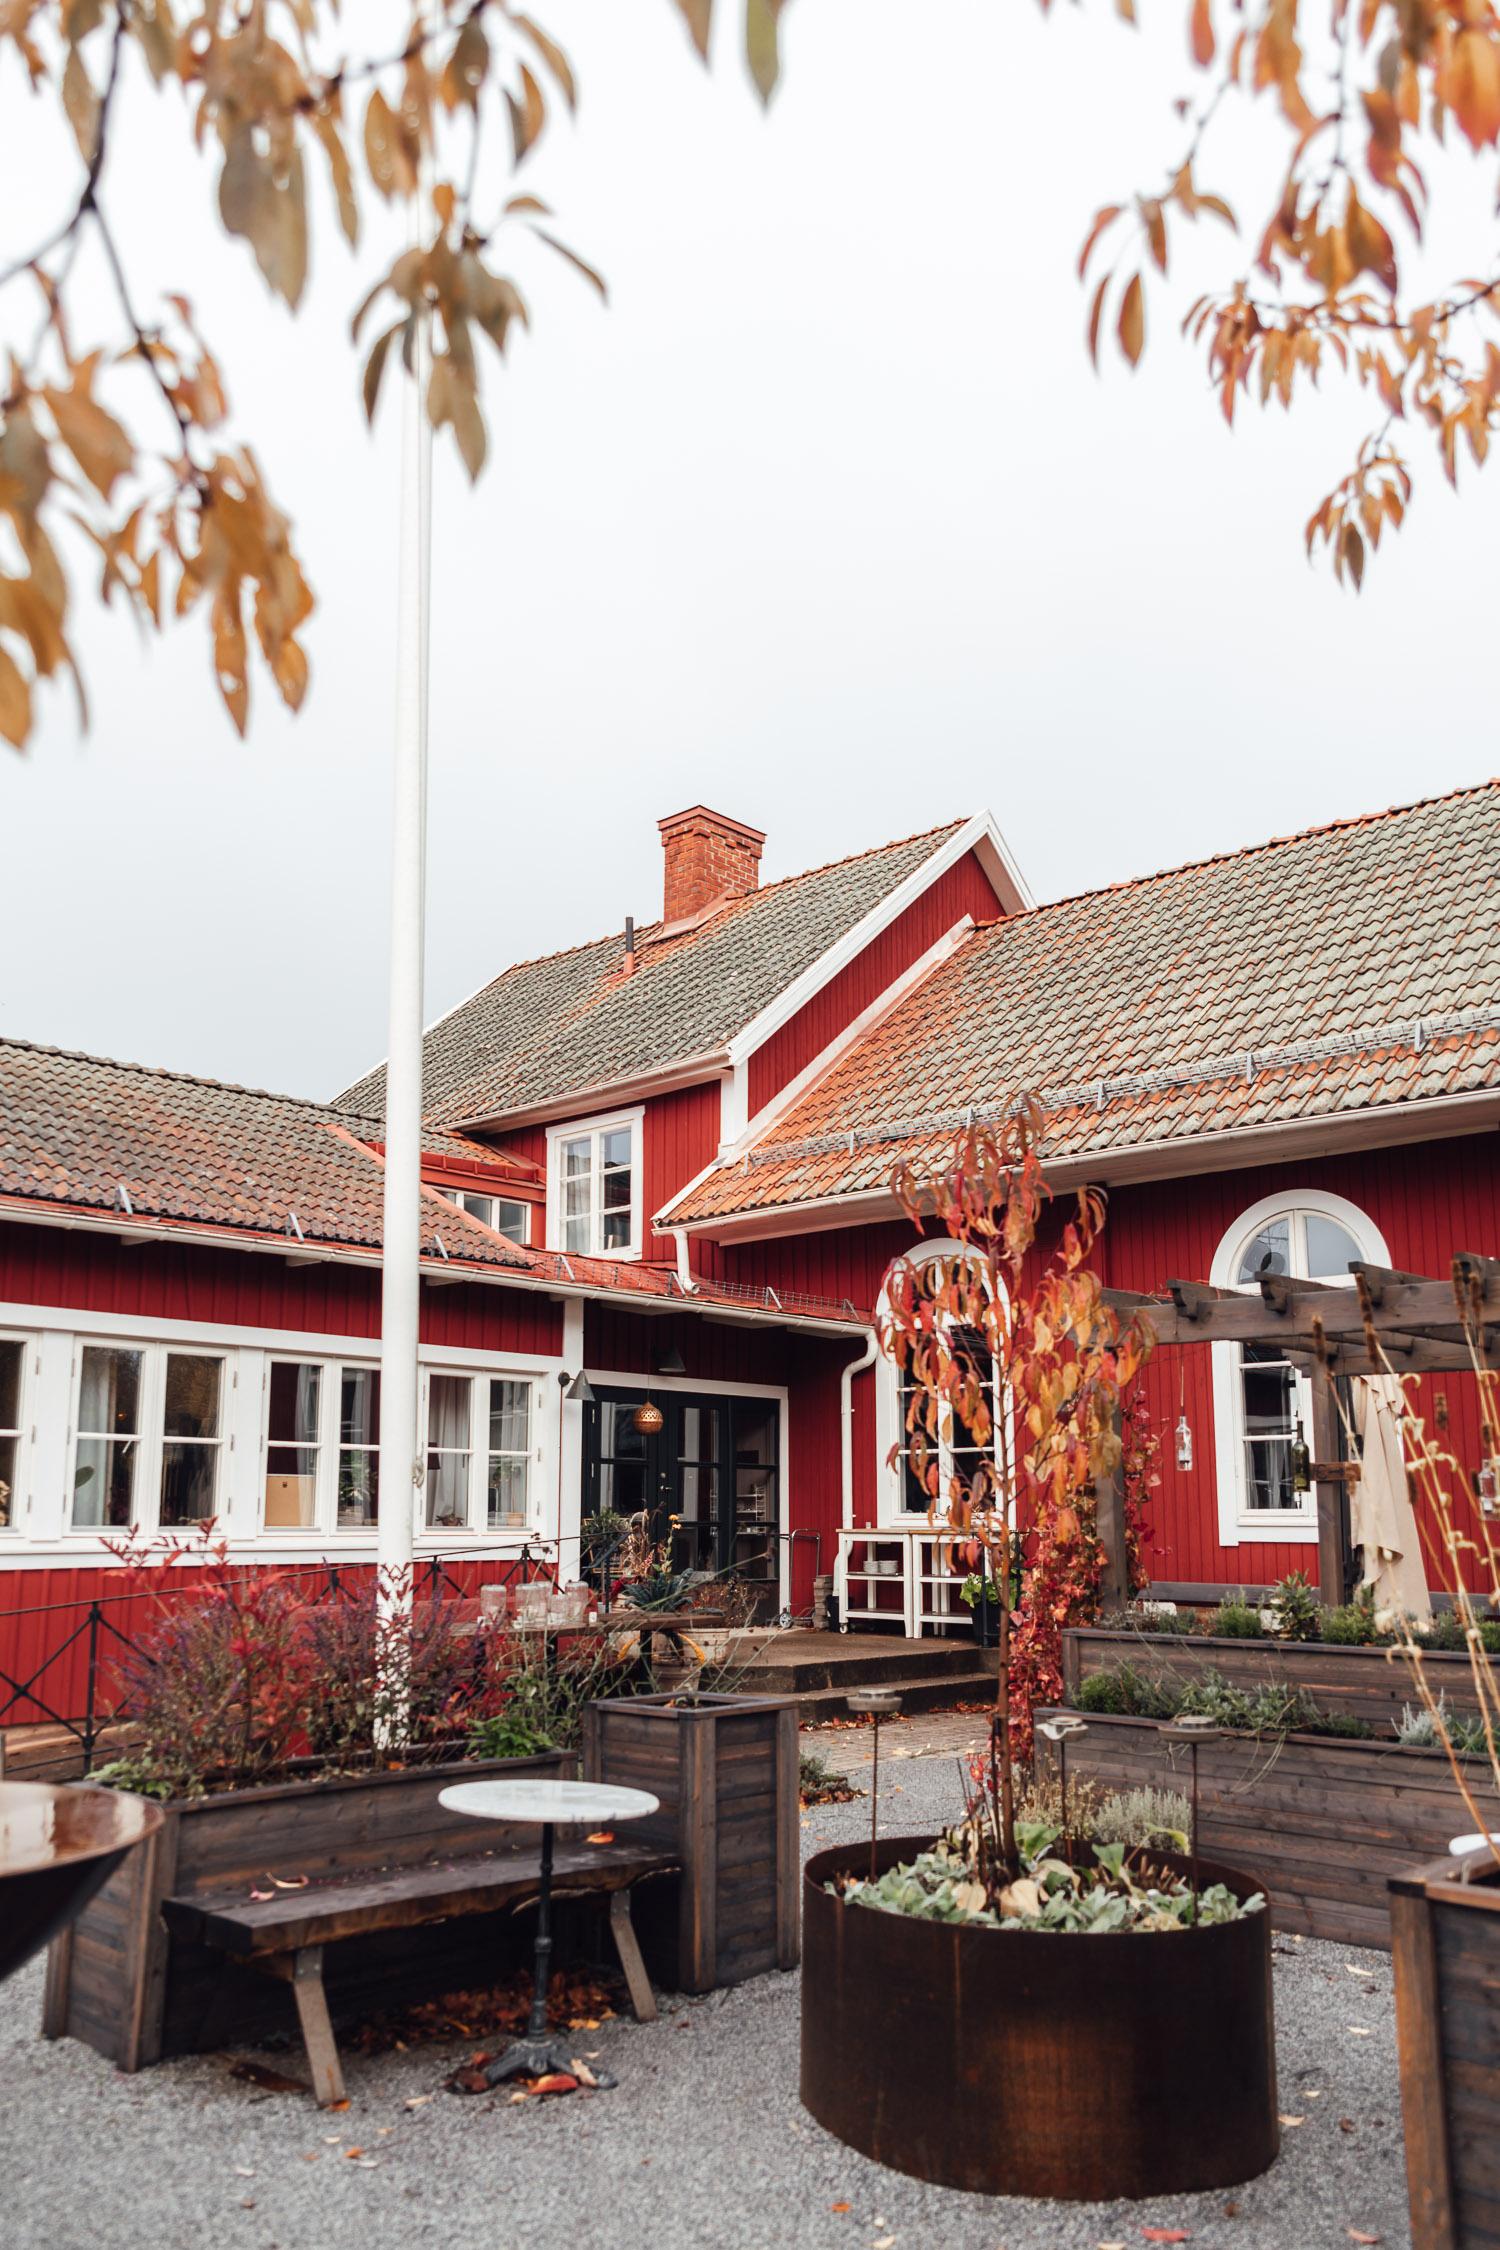 Restaurant Egastronomi in Kumla